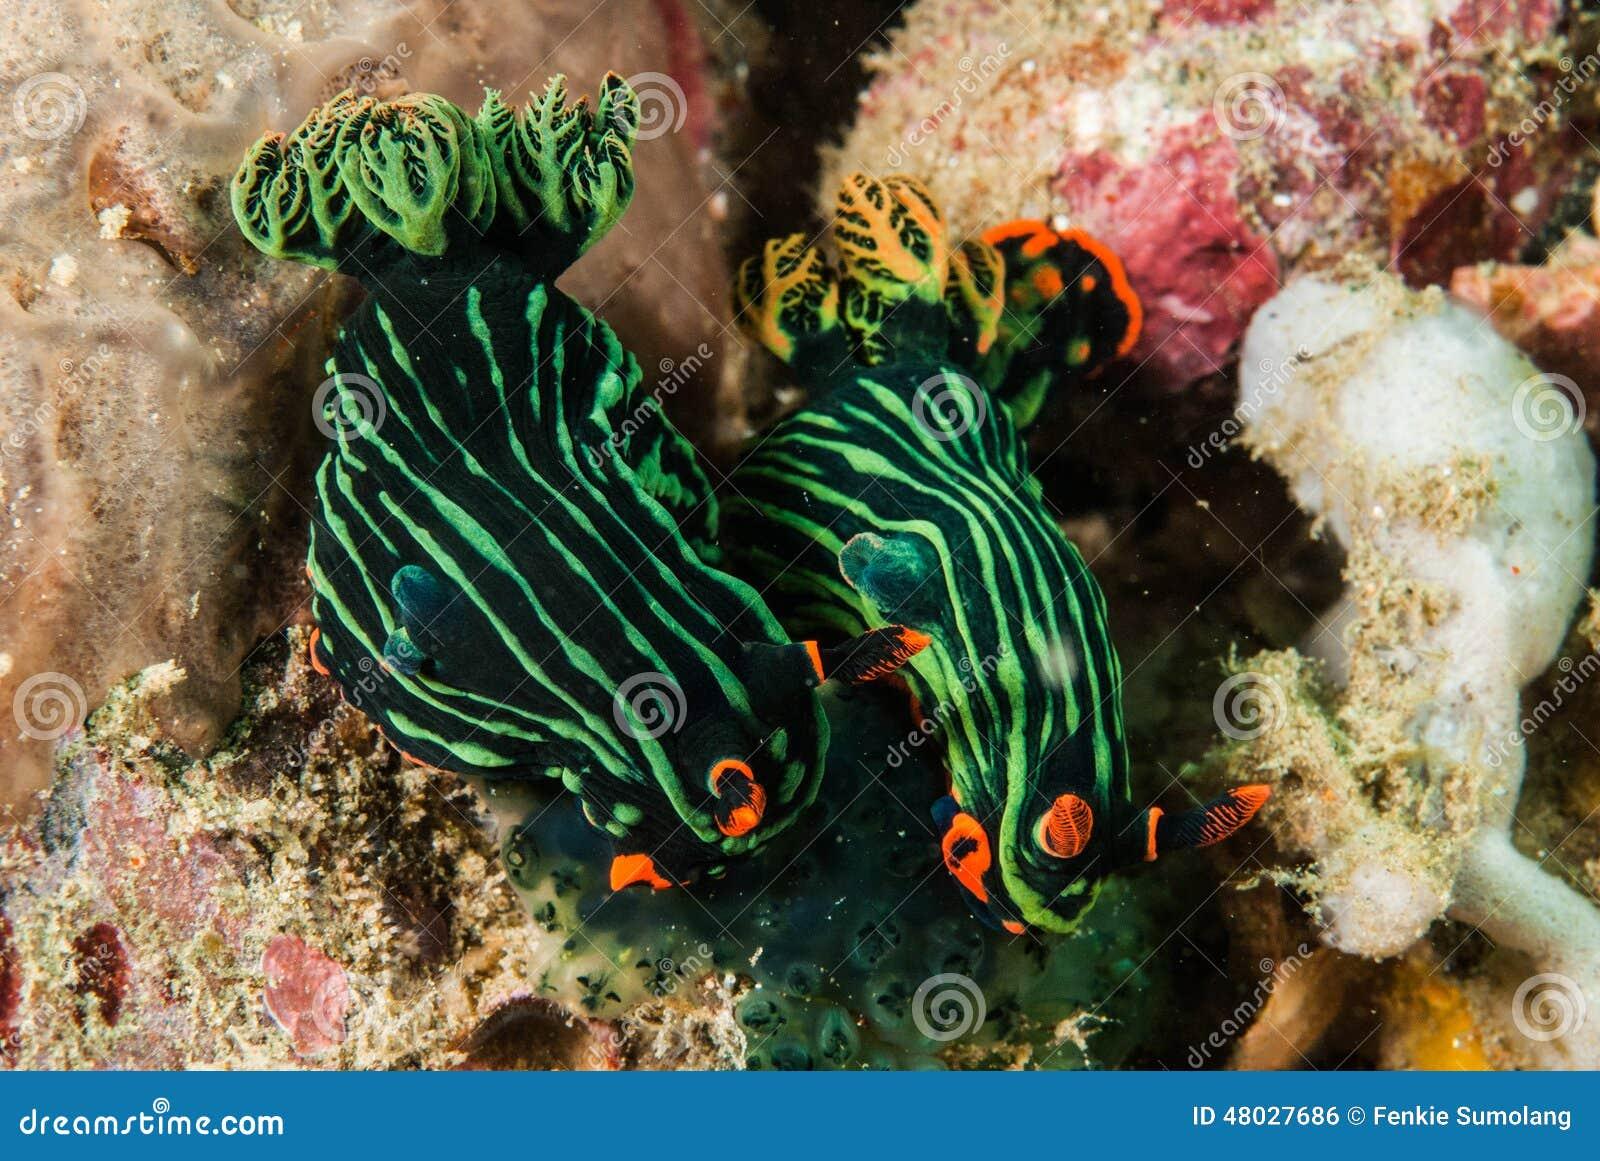 Dwa nudibranch w Ambon, Maluku, Indonezja podwodna fotografia